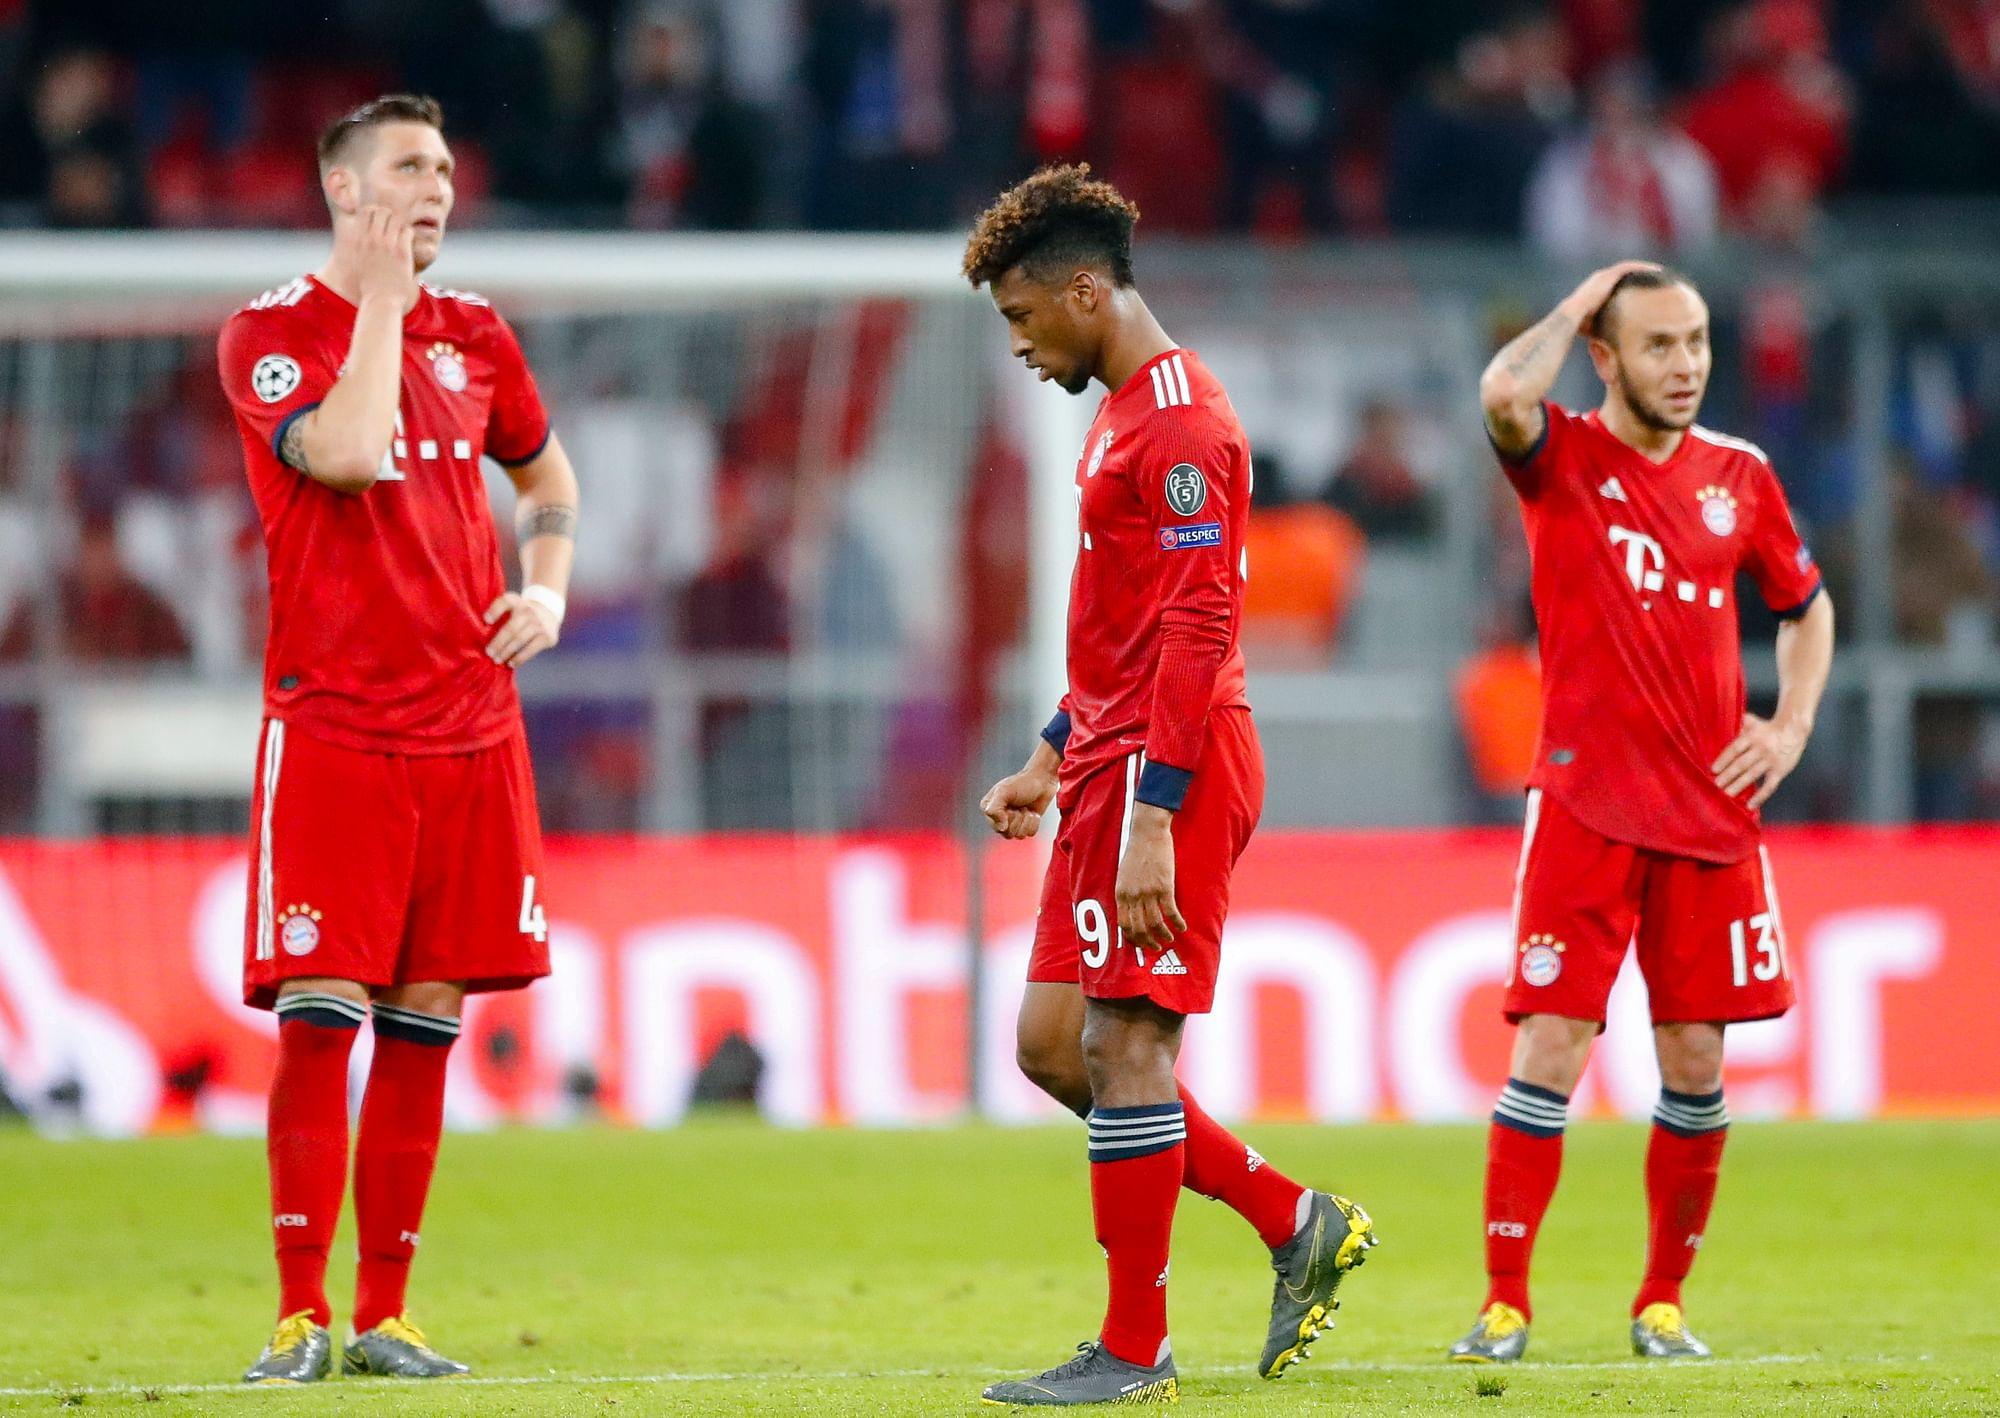 Bayern Munich U2019s Decline Laid Bare By Liverpool